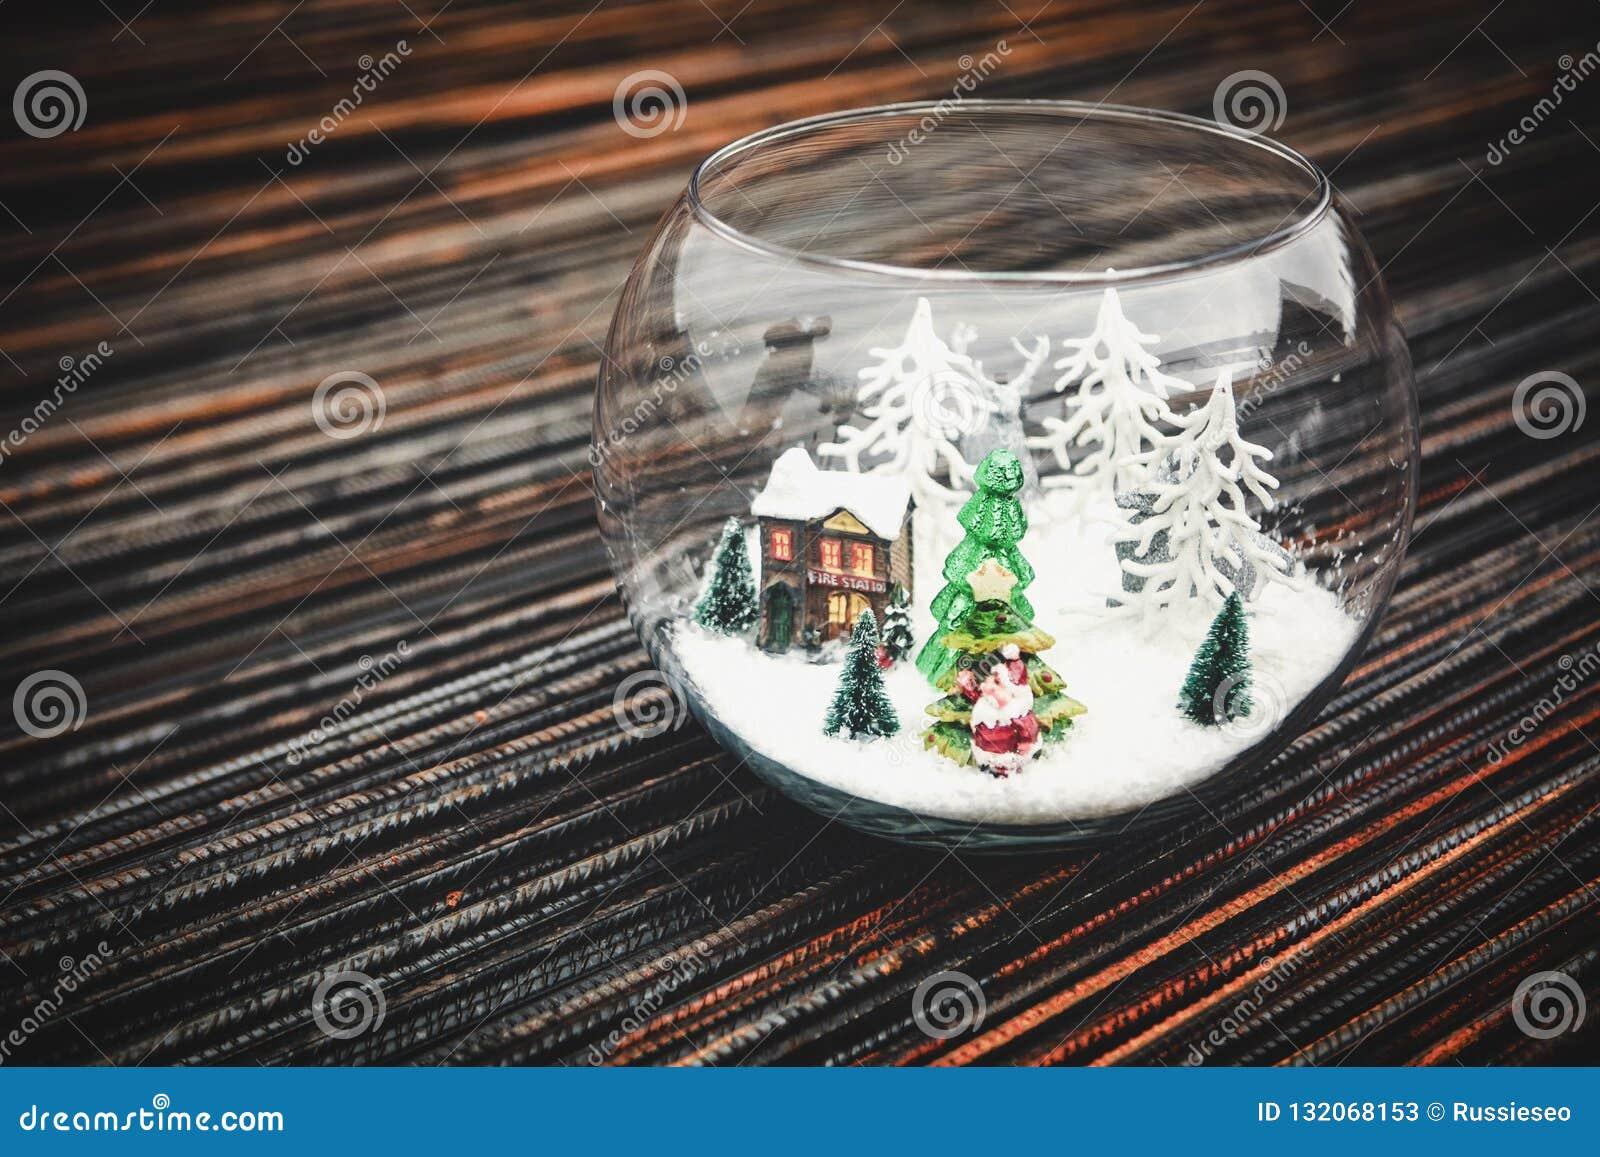 Christmas Decorations In Aquarium Stock Image Image Of Decoration Festive 132068153